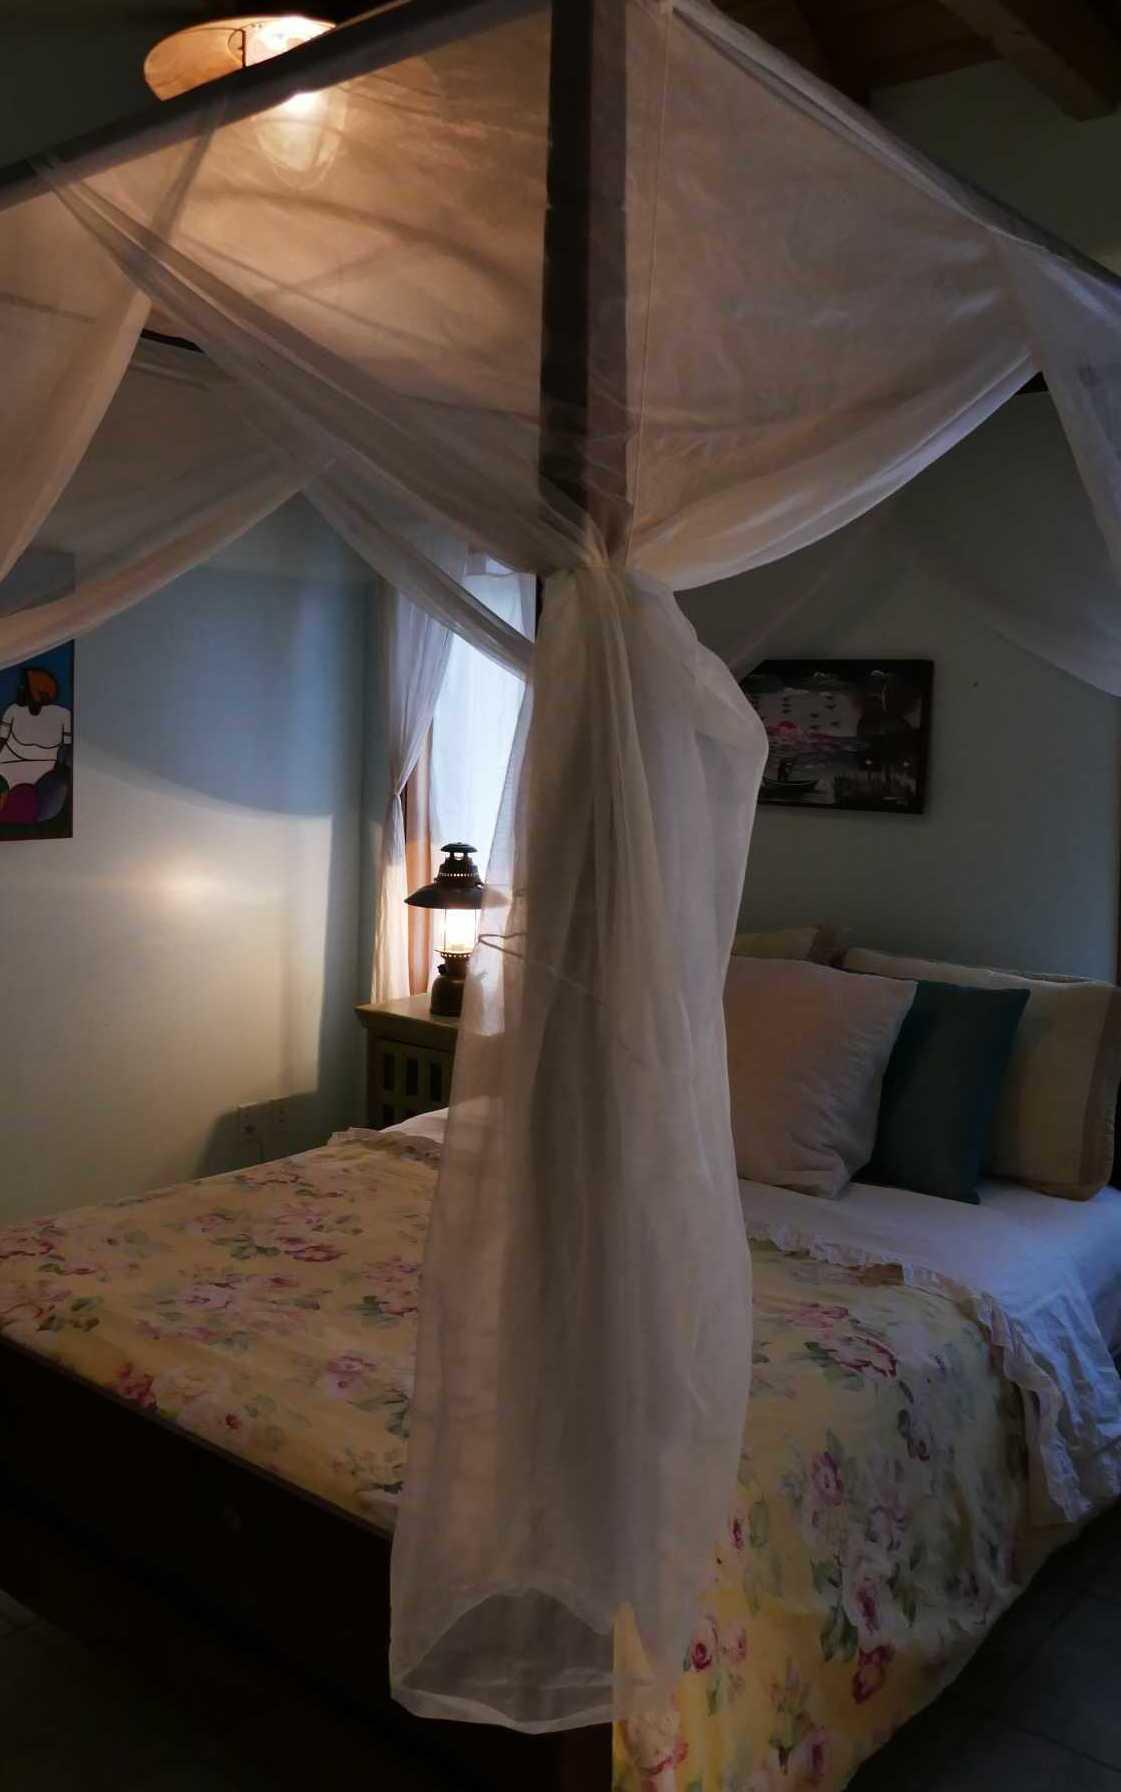 Vacation Rentals in Roatan Honduras   Casa Del Solomon Roatan, Honduras  16